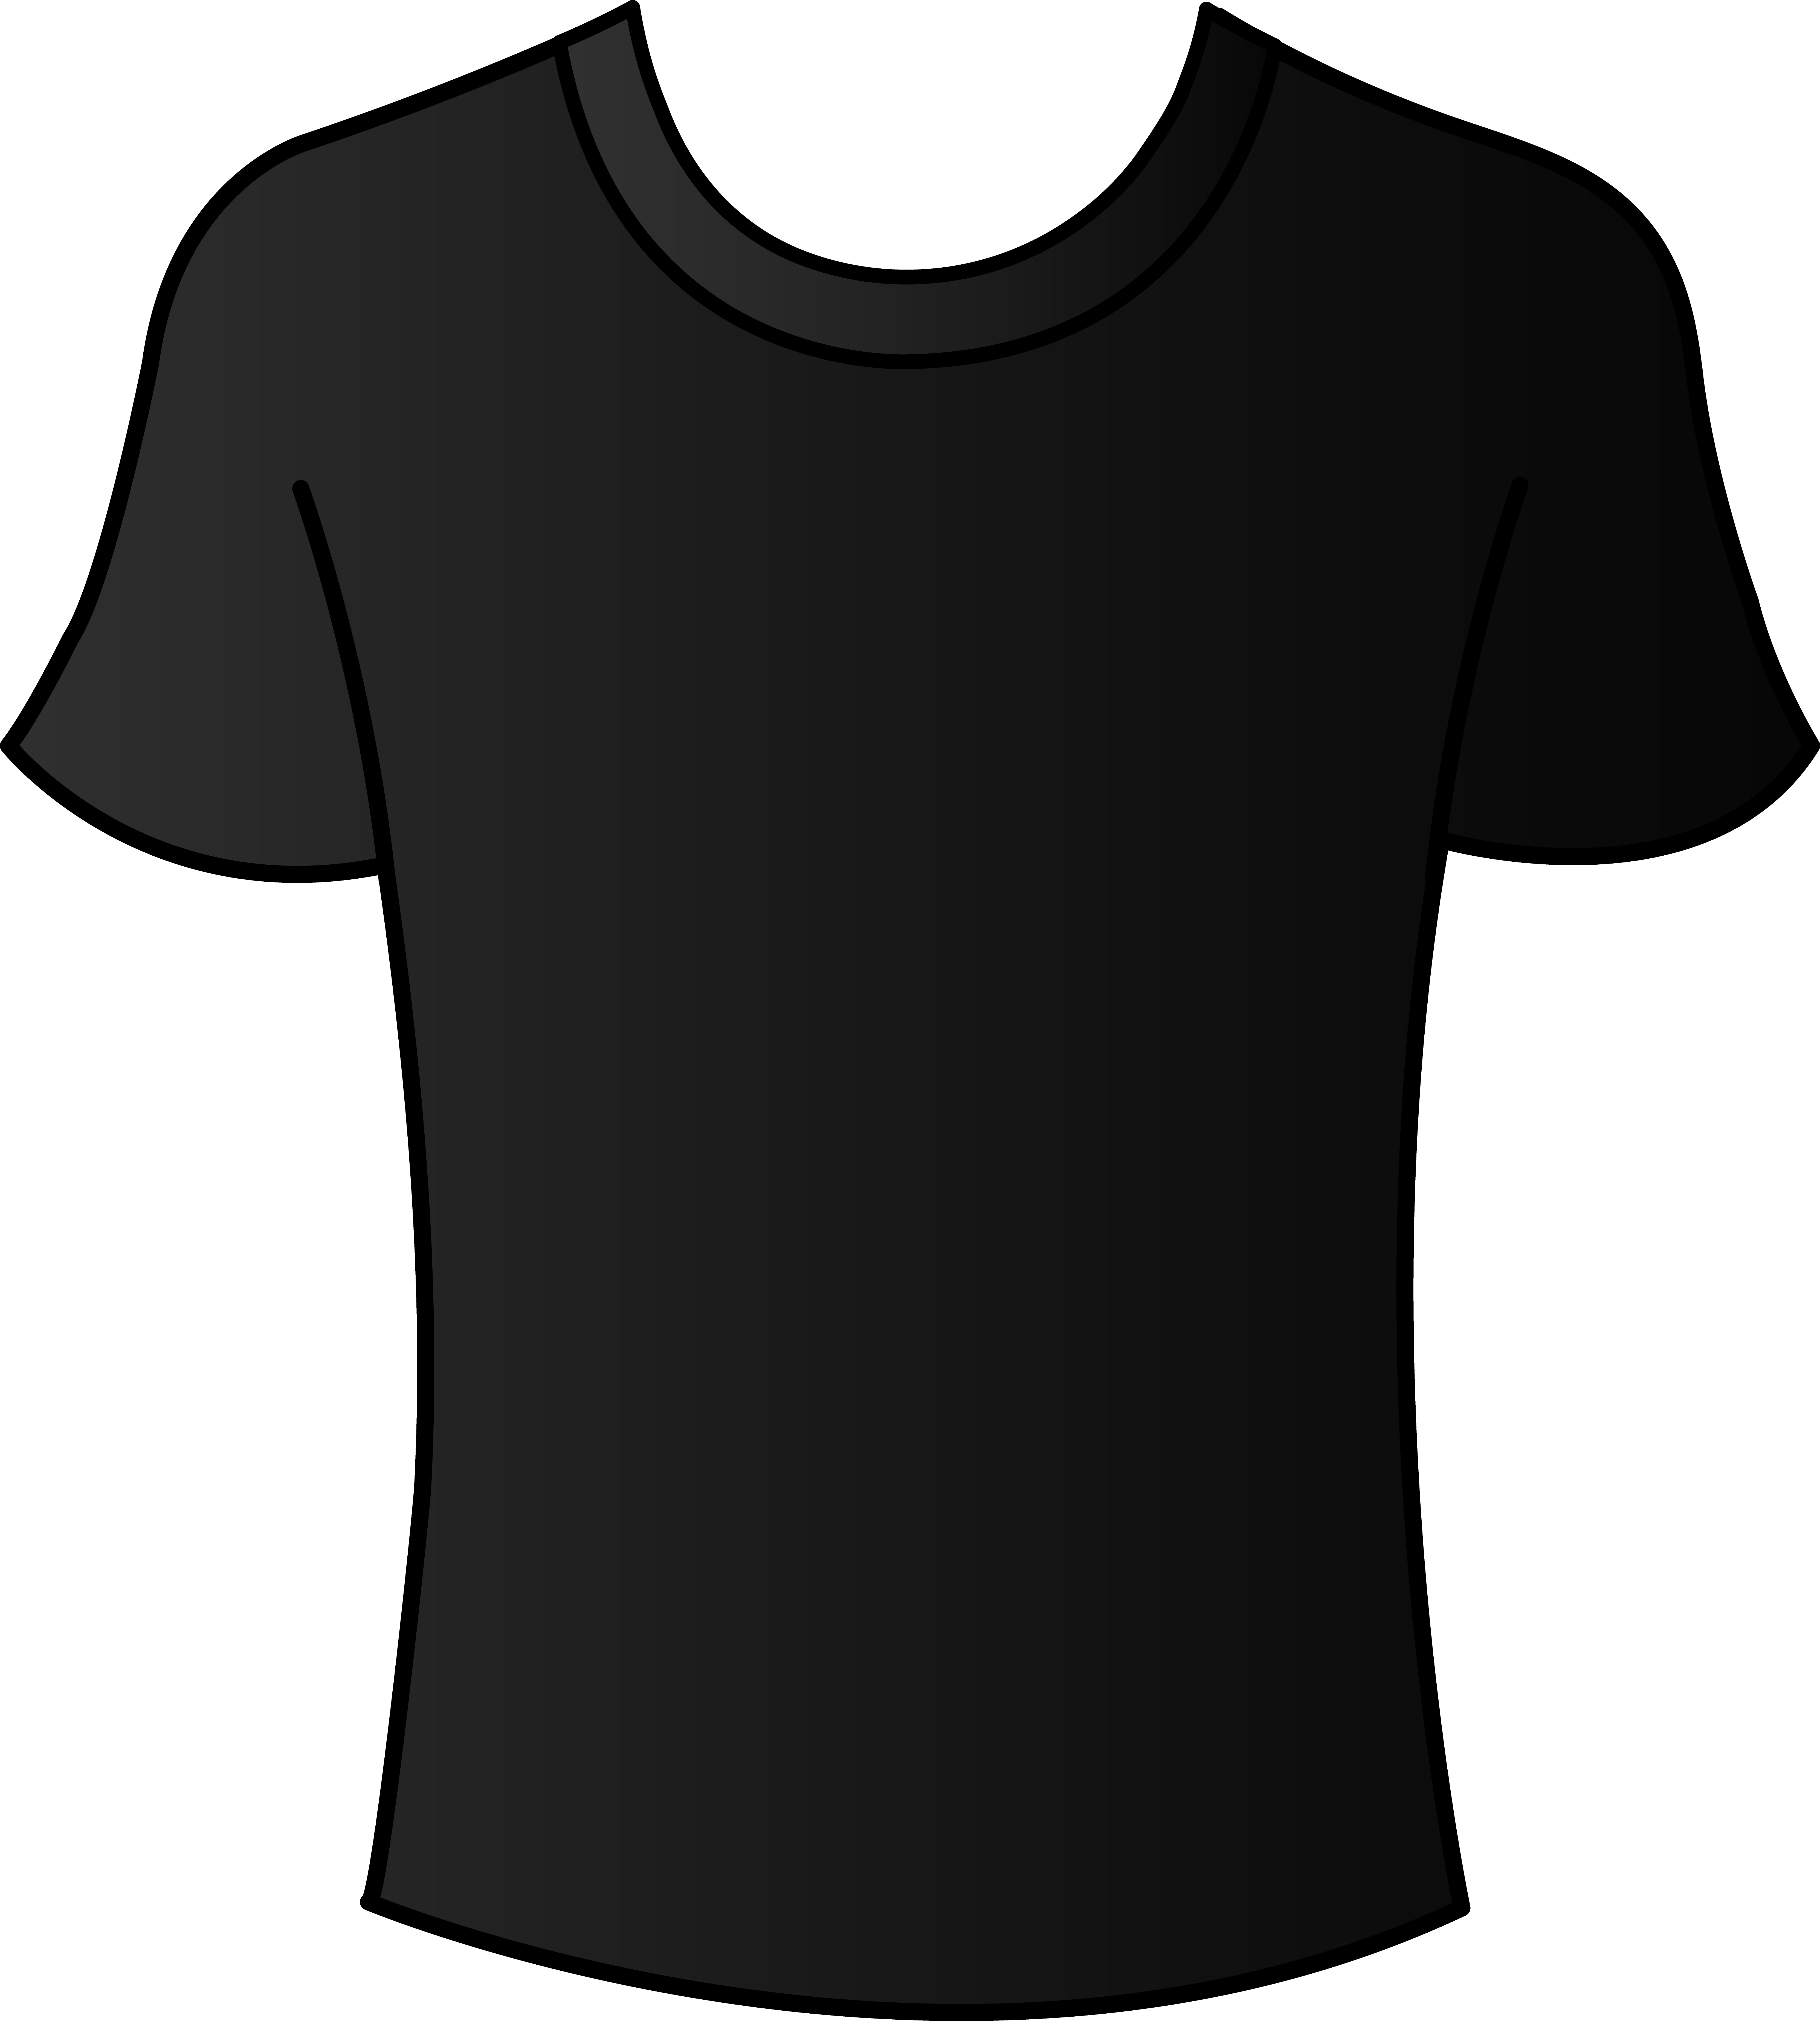 6652x7386 T Shirt Mens Black Shirt Template Free Clip Art